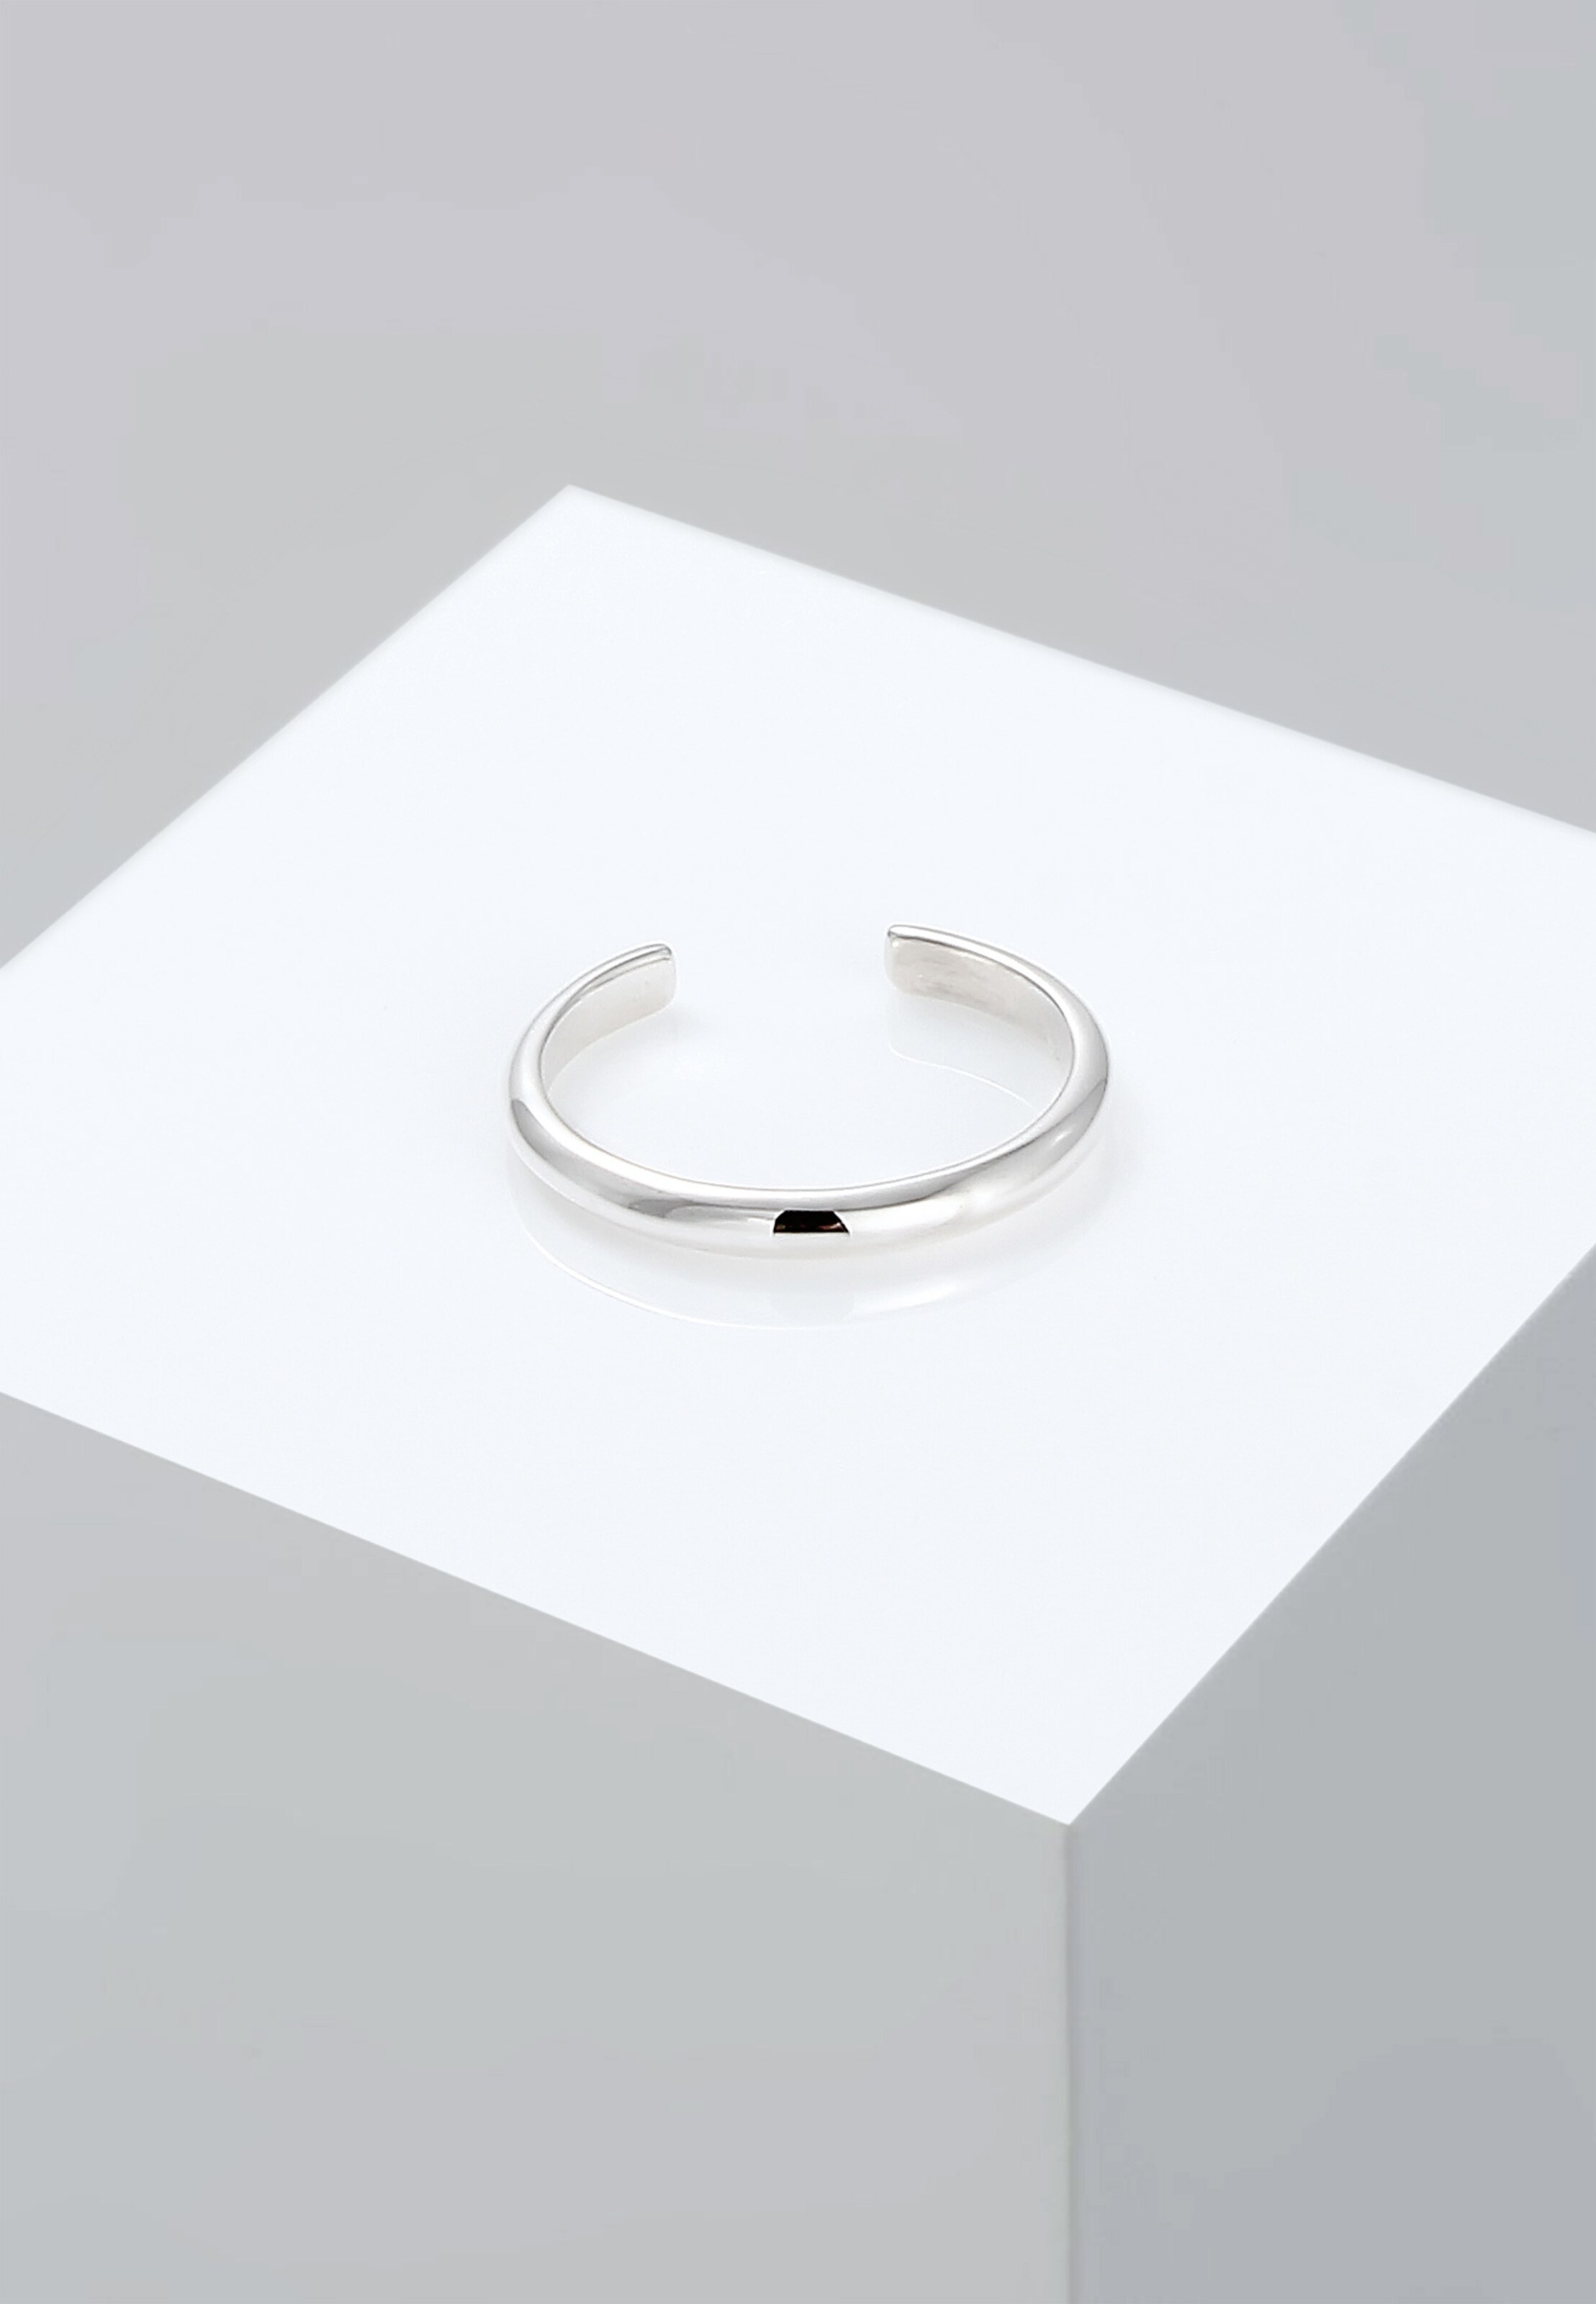 Ring In Silber 'geo' Elli Ring Elli 6IbfymY7gv